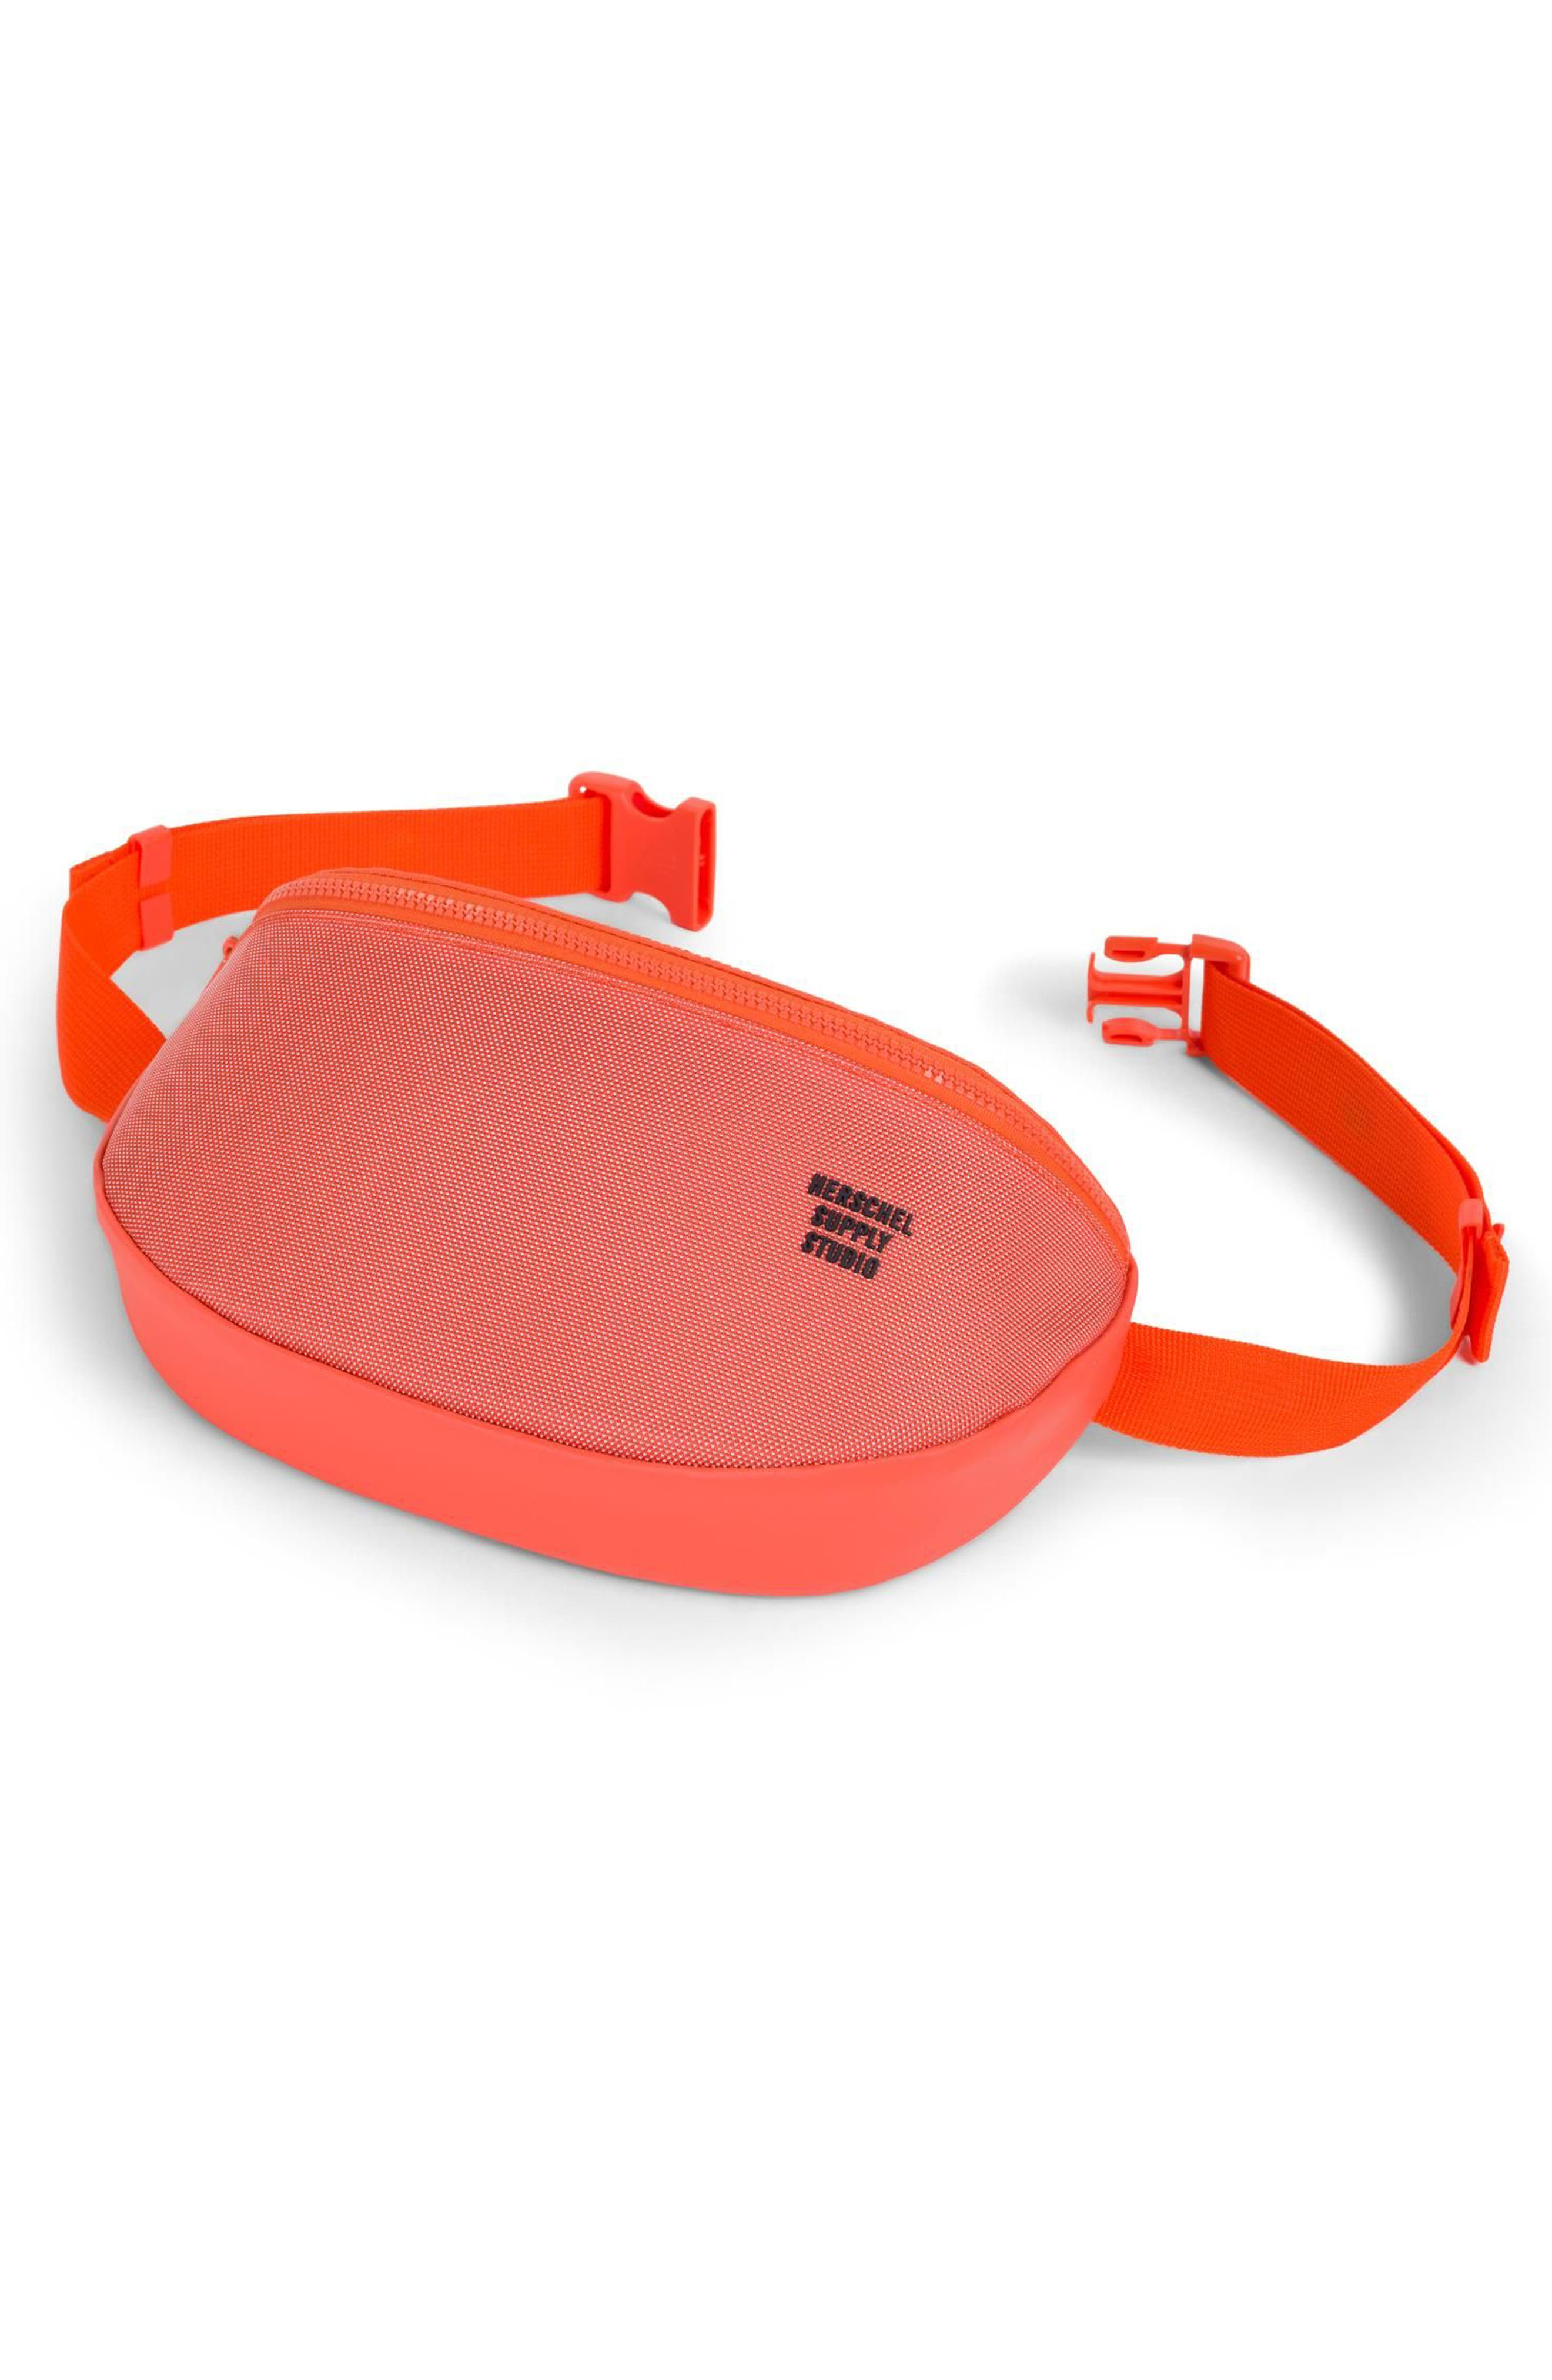 Sixteen Studio Belt Bag,                             Alternate thumbnail 2, color,                             Vermillion Orange